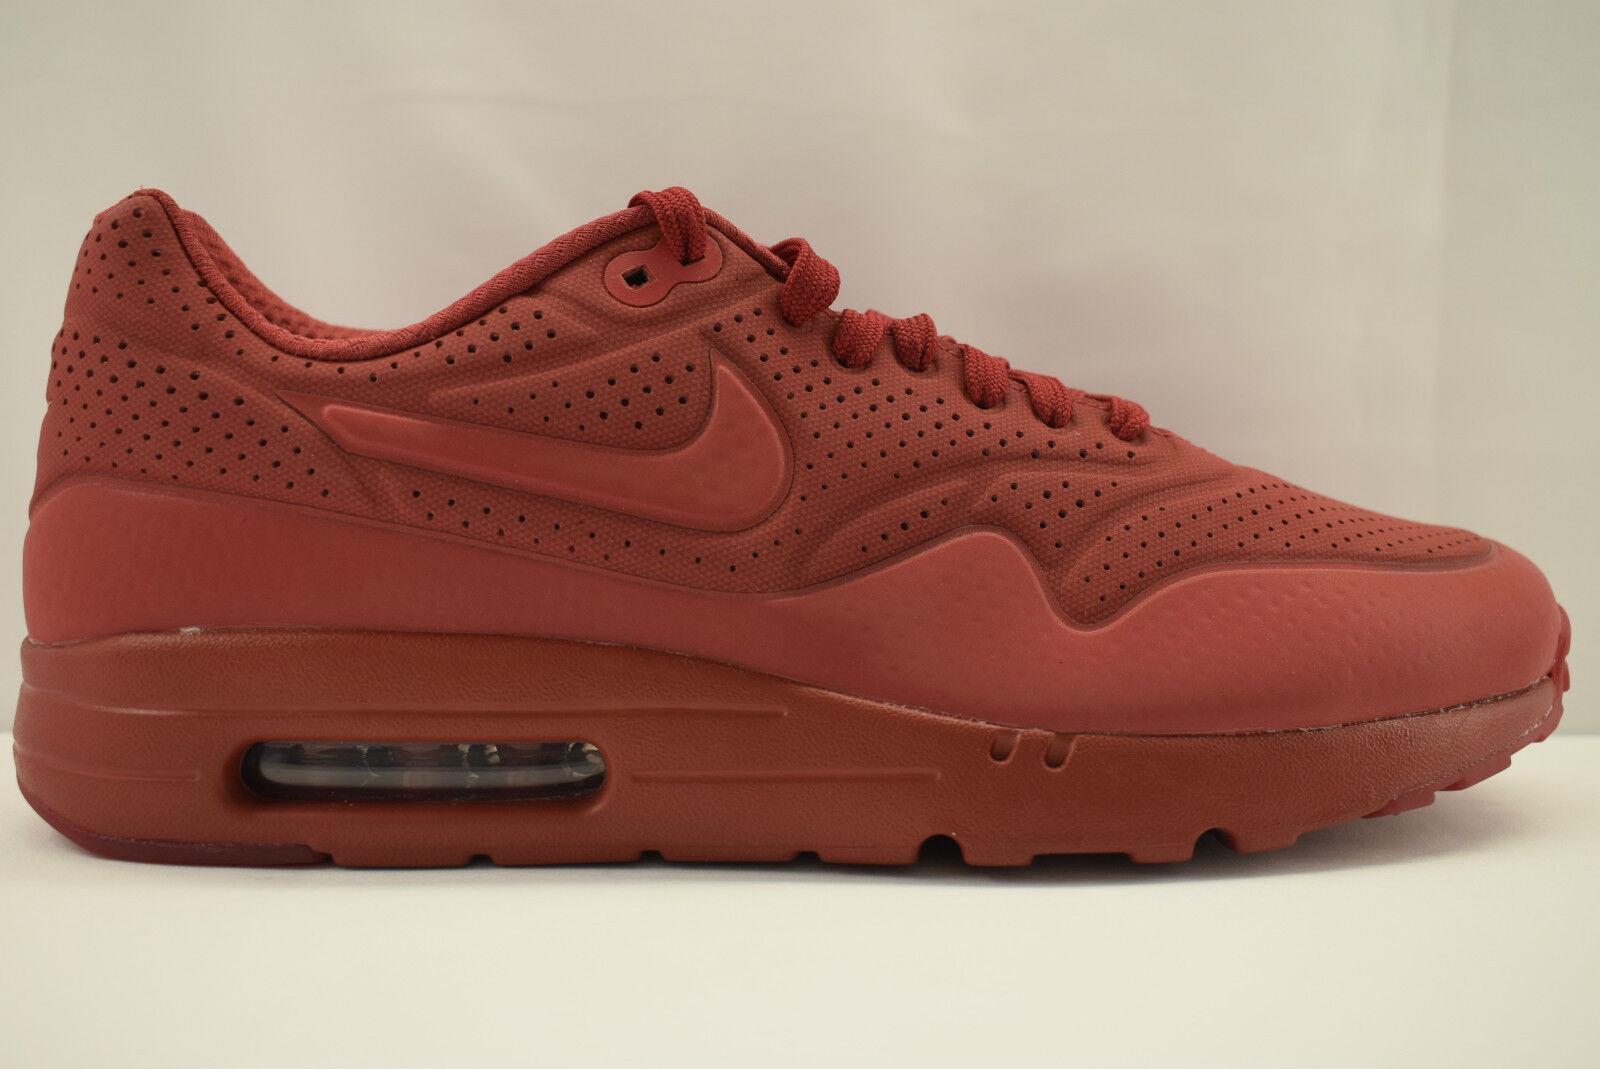 Nike Air Max 1  Ultra Moire 705297 606  1 Herrenschuhe Sneaker ROT a07ffd